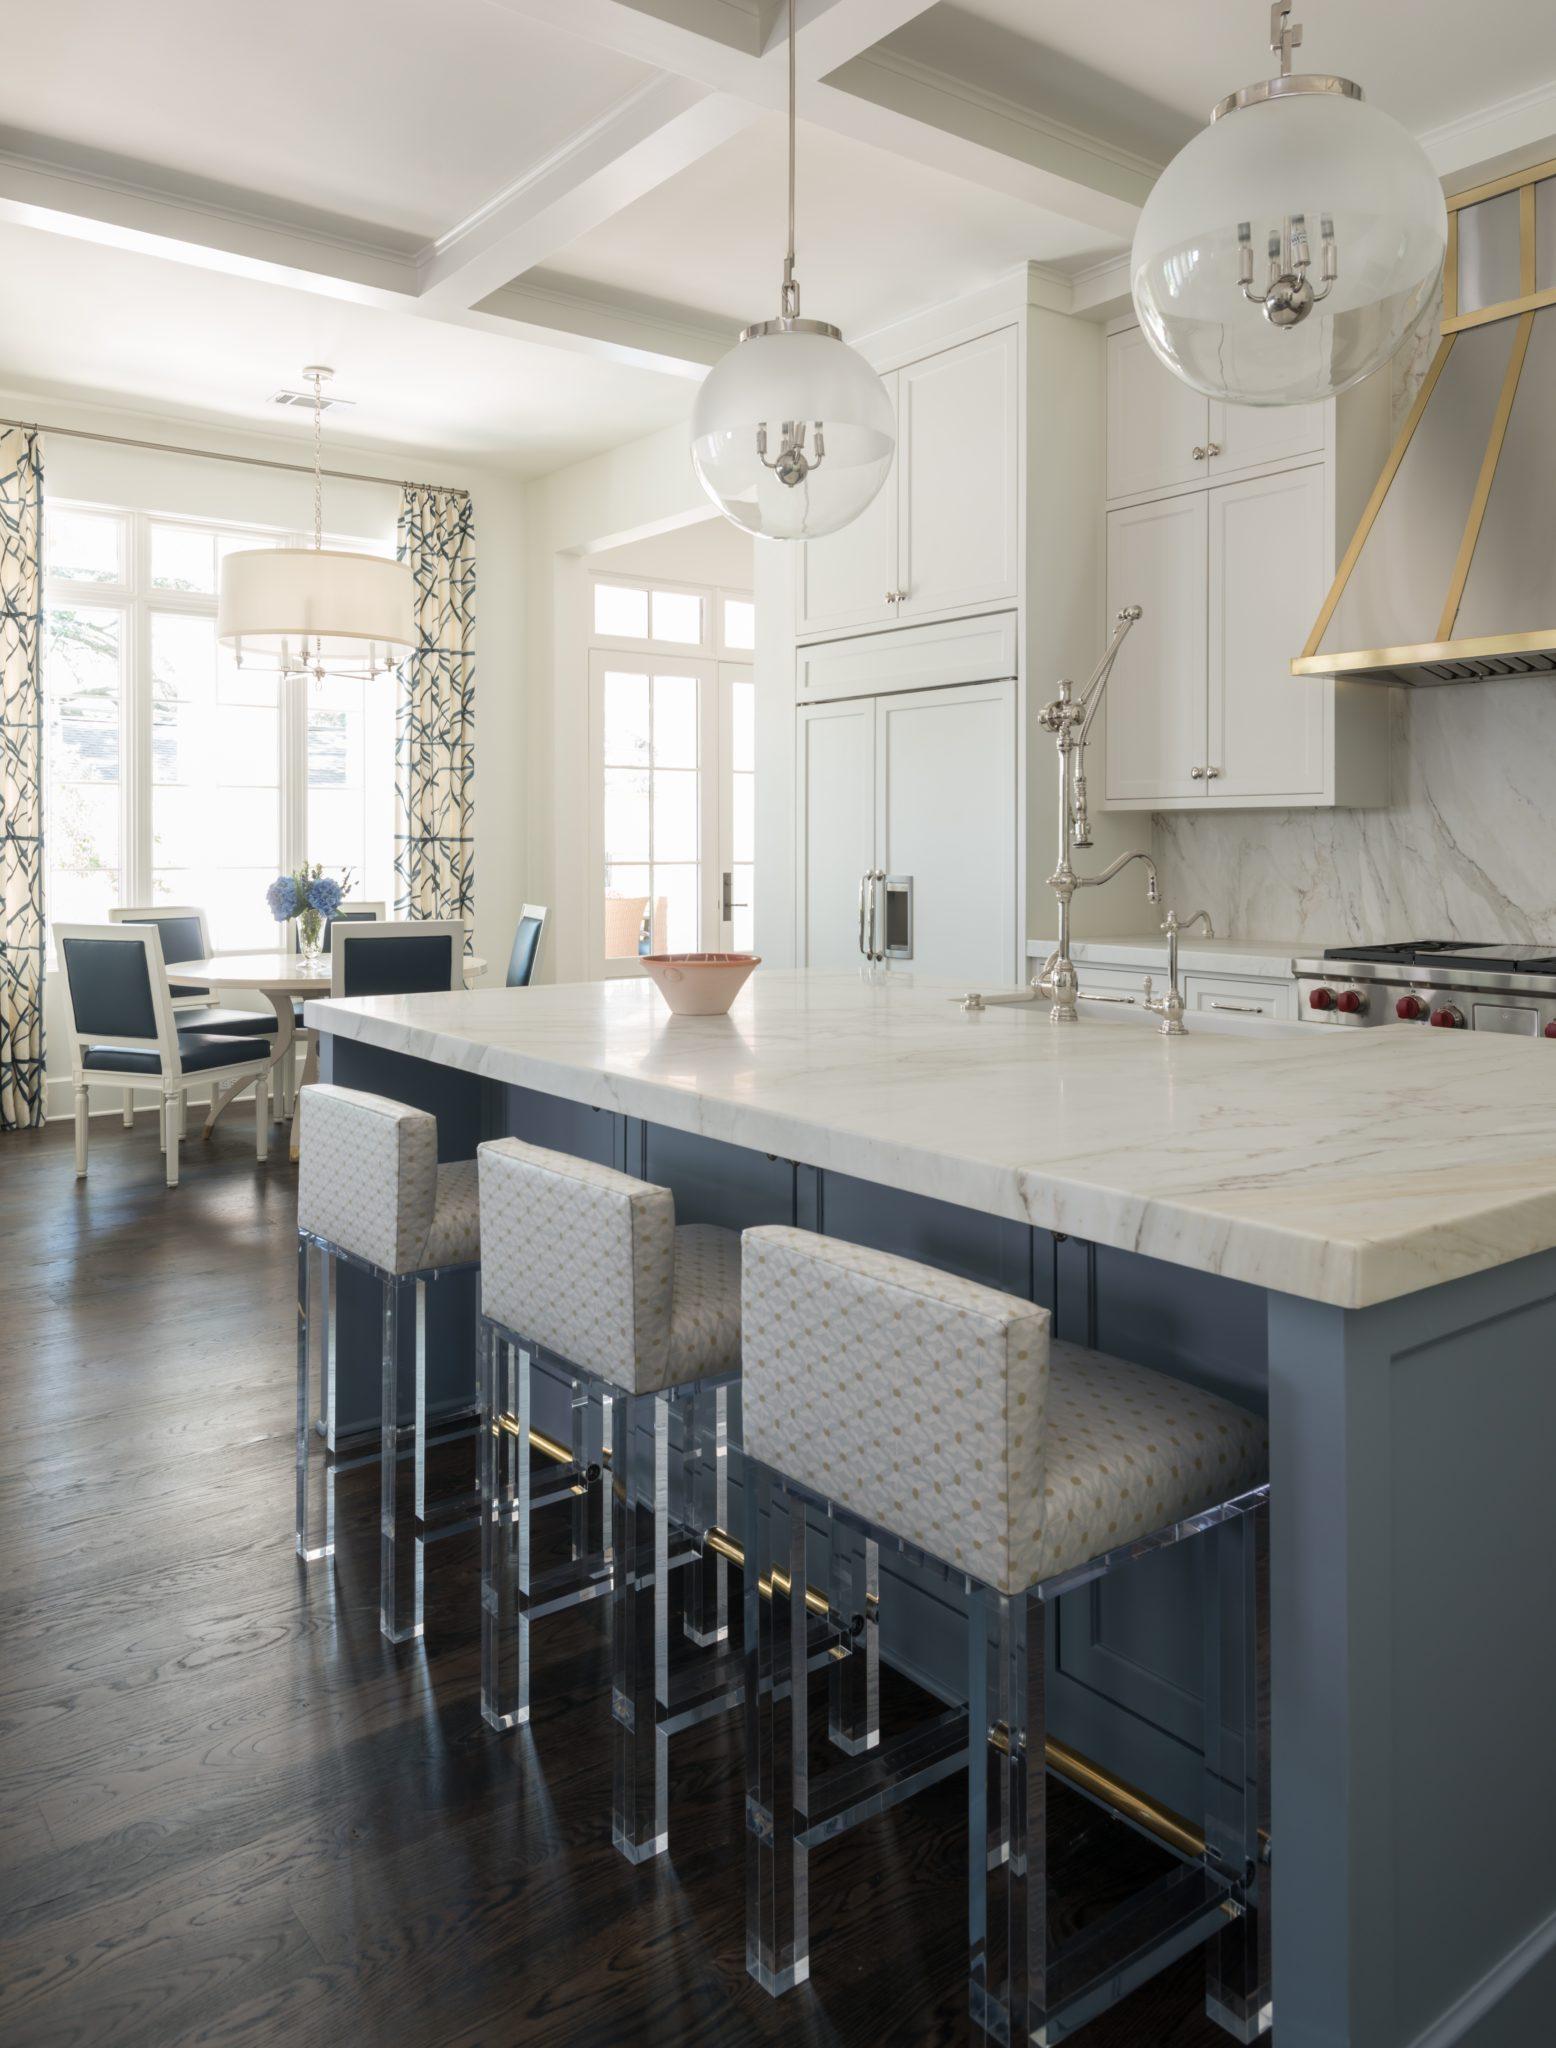 Terwilliger kitchen andbreakfast by Munger Interiors